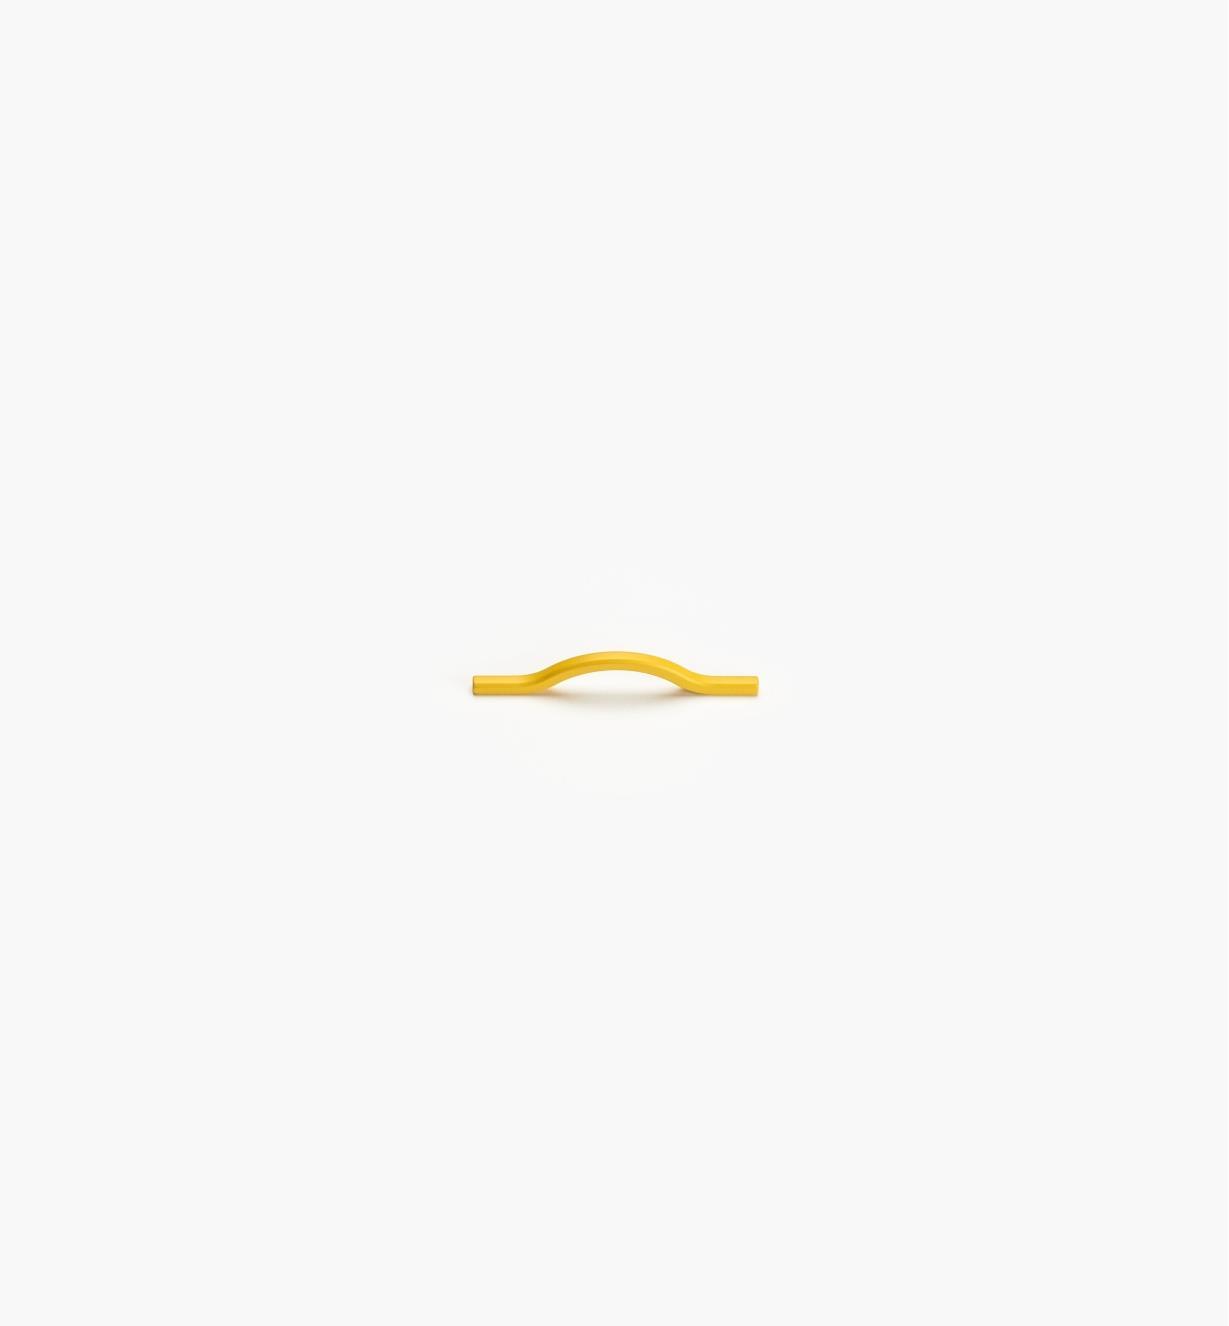 00W5444 - Poignée Hillock, jaune, 96/128 mm x 26 mm (140 mm)